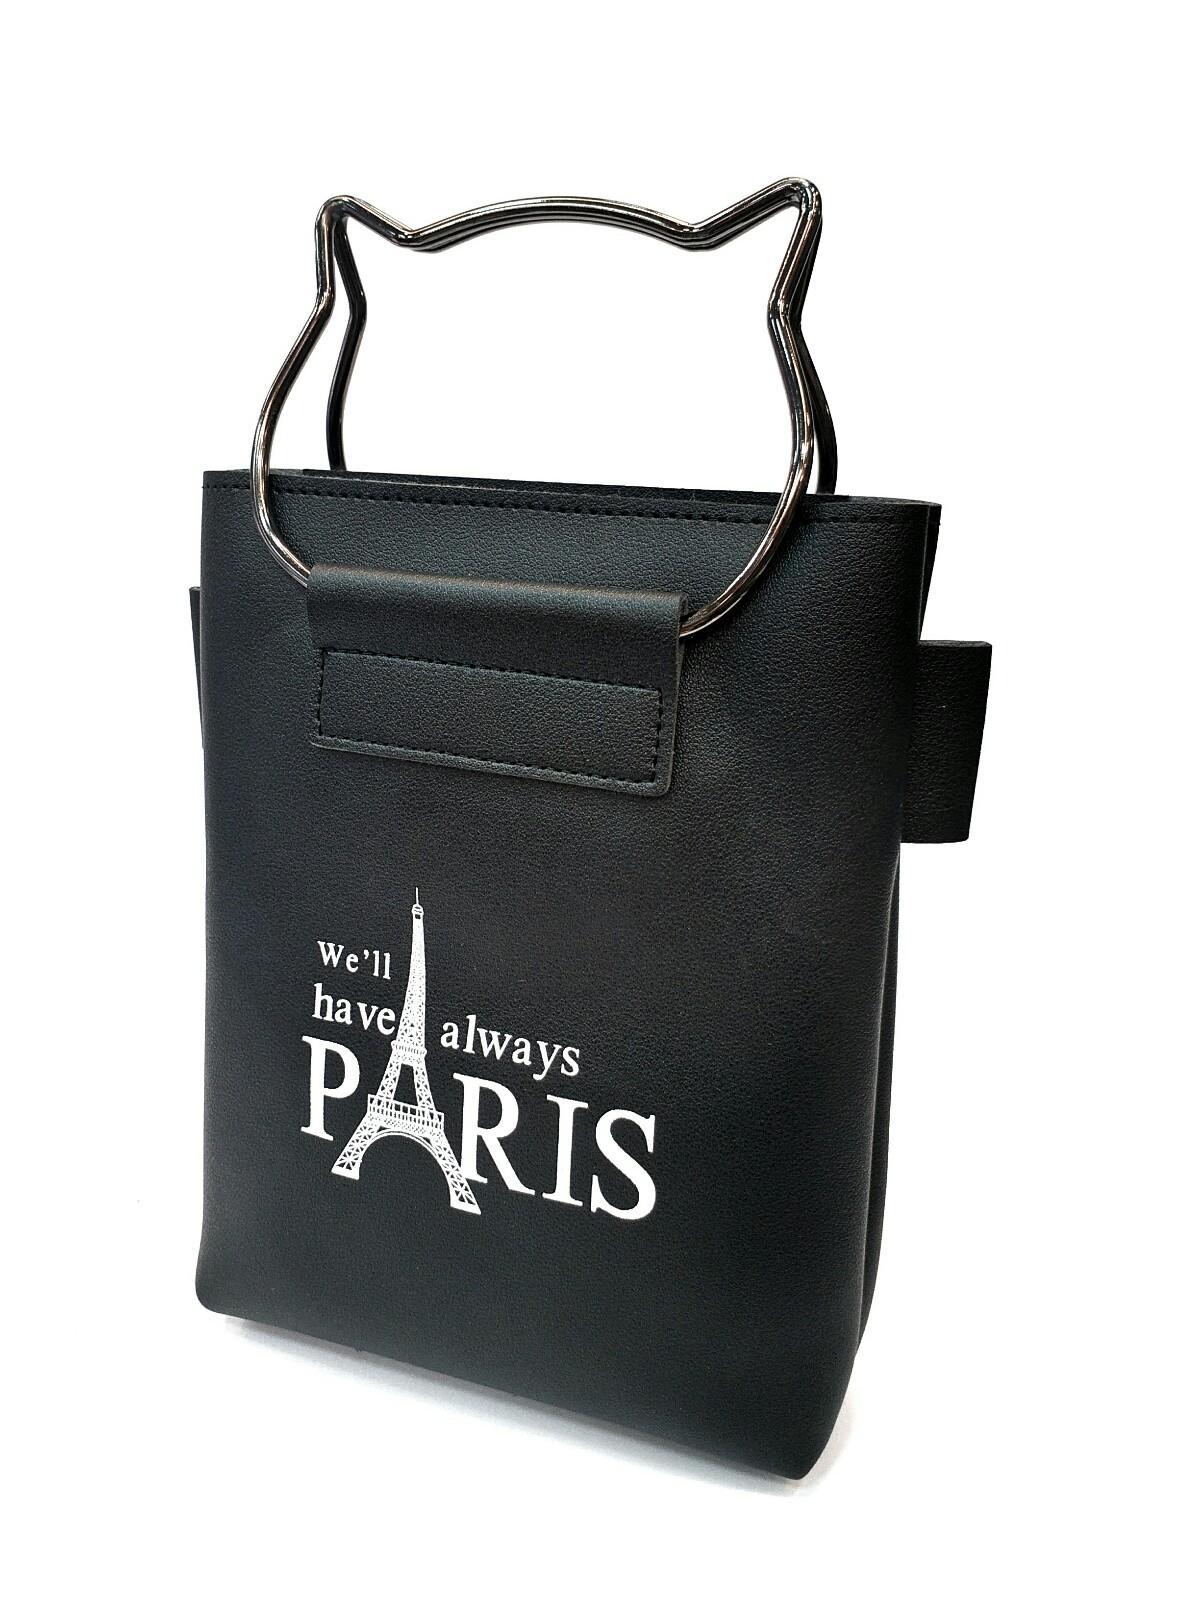 eb20fdf73f85 Monogram Handbags Cross Body Bags N oNo Louis Vuitton Source · Buy Branded  Ladies   Girls Hand Bags Best Price in Pakistan Daraz pk